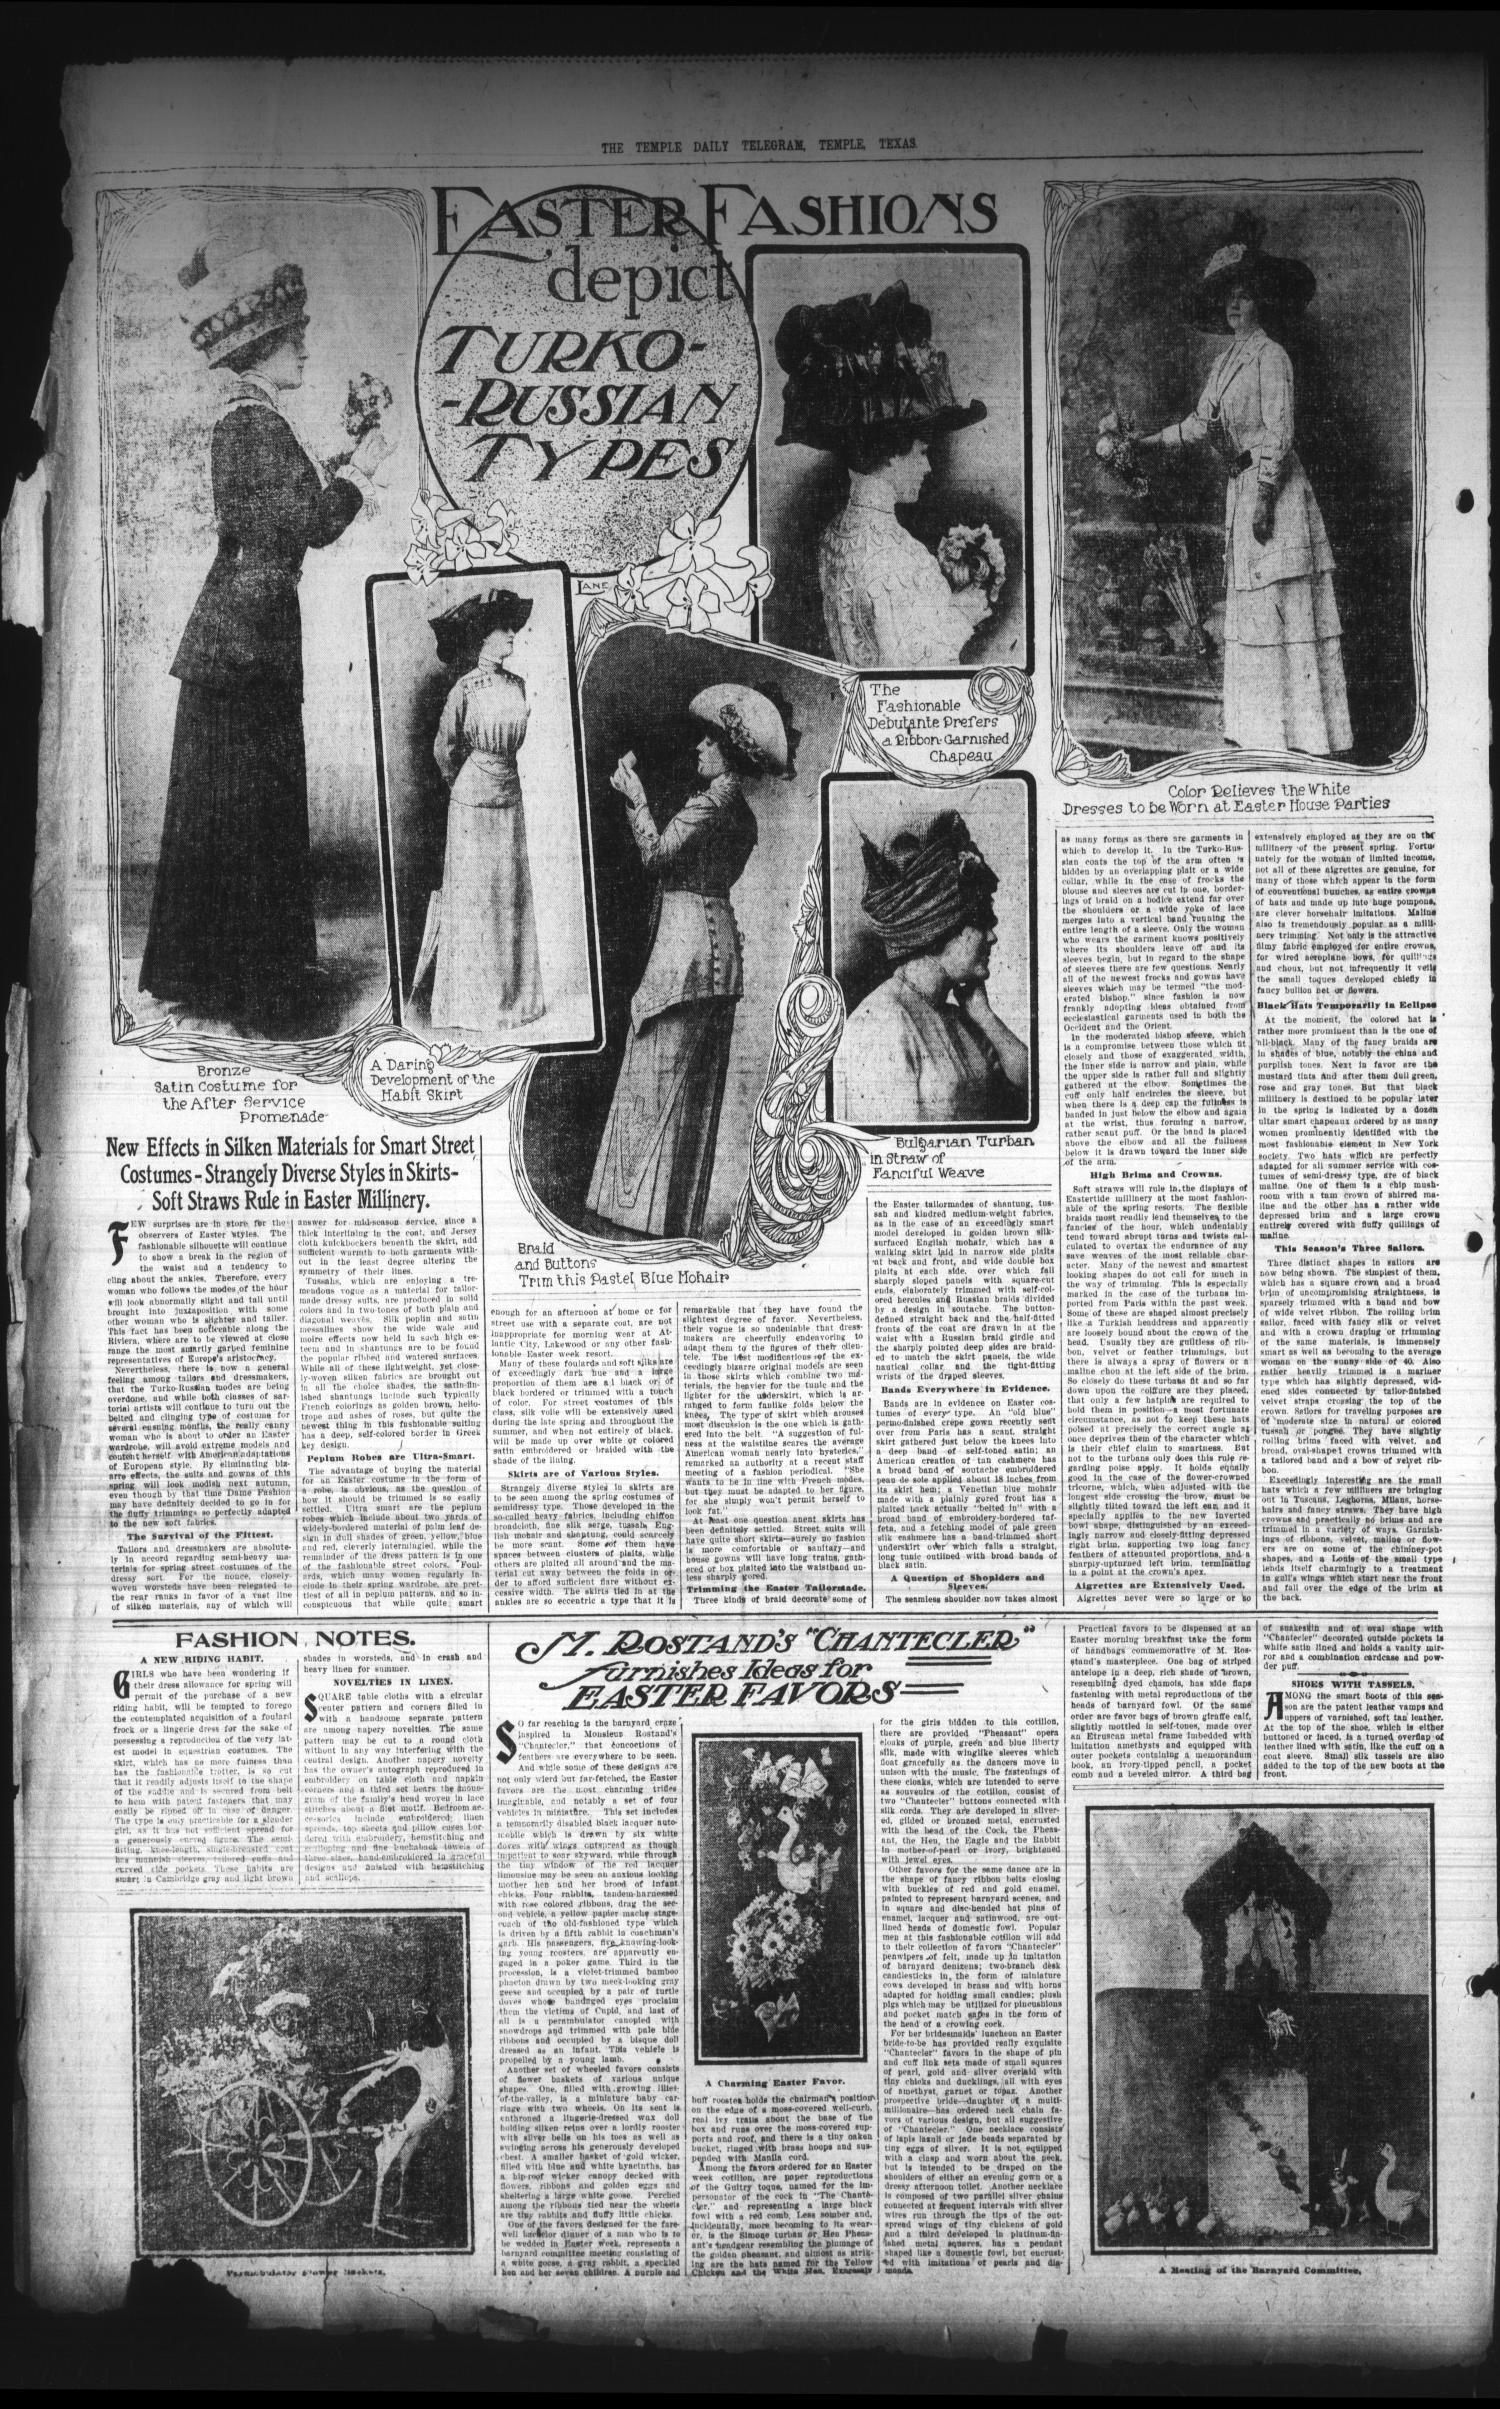 The Temple Daily Telegram  (Temple, Tex ), Vol  3, No  128, Ed  1